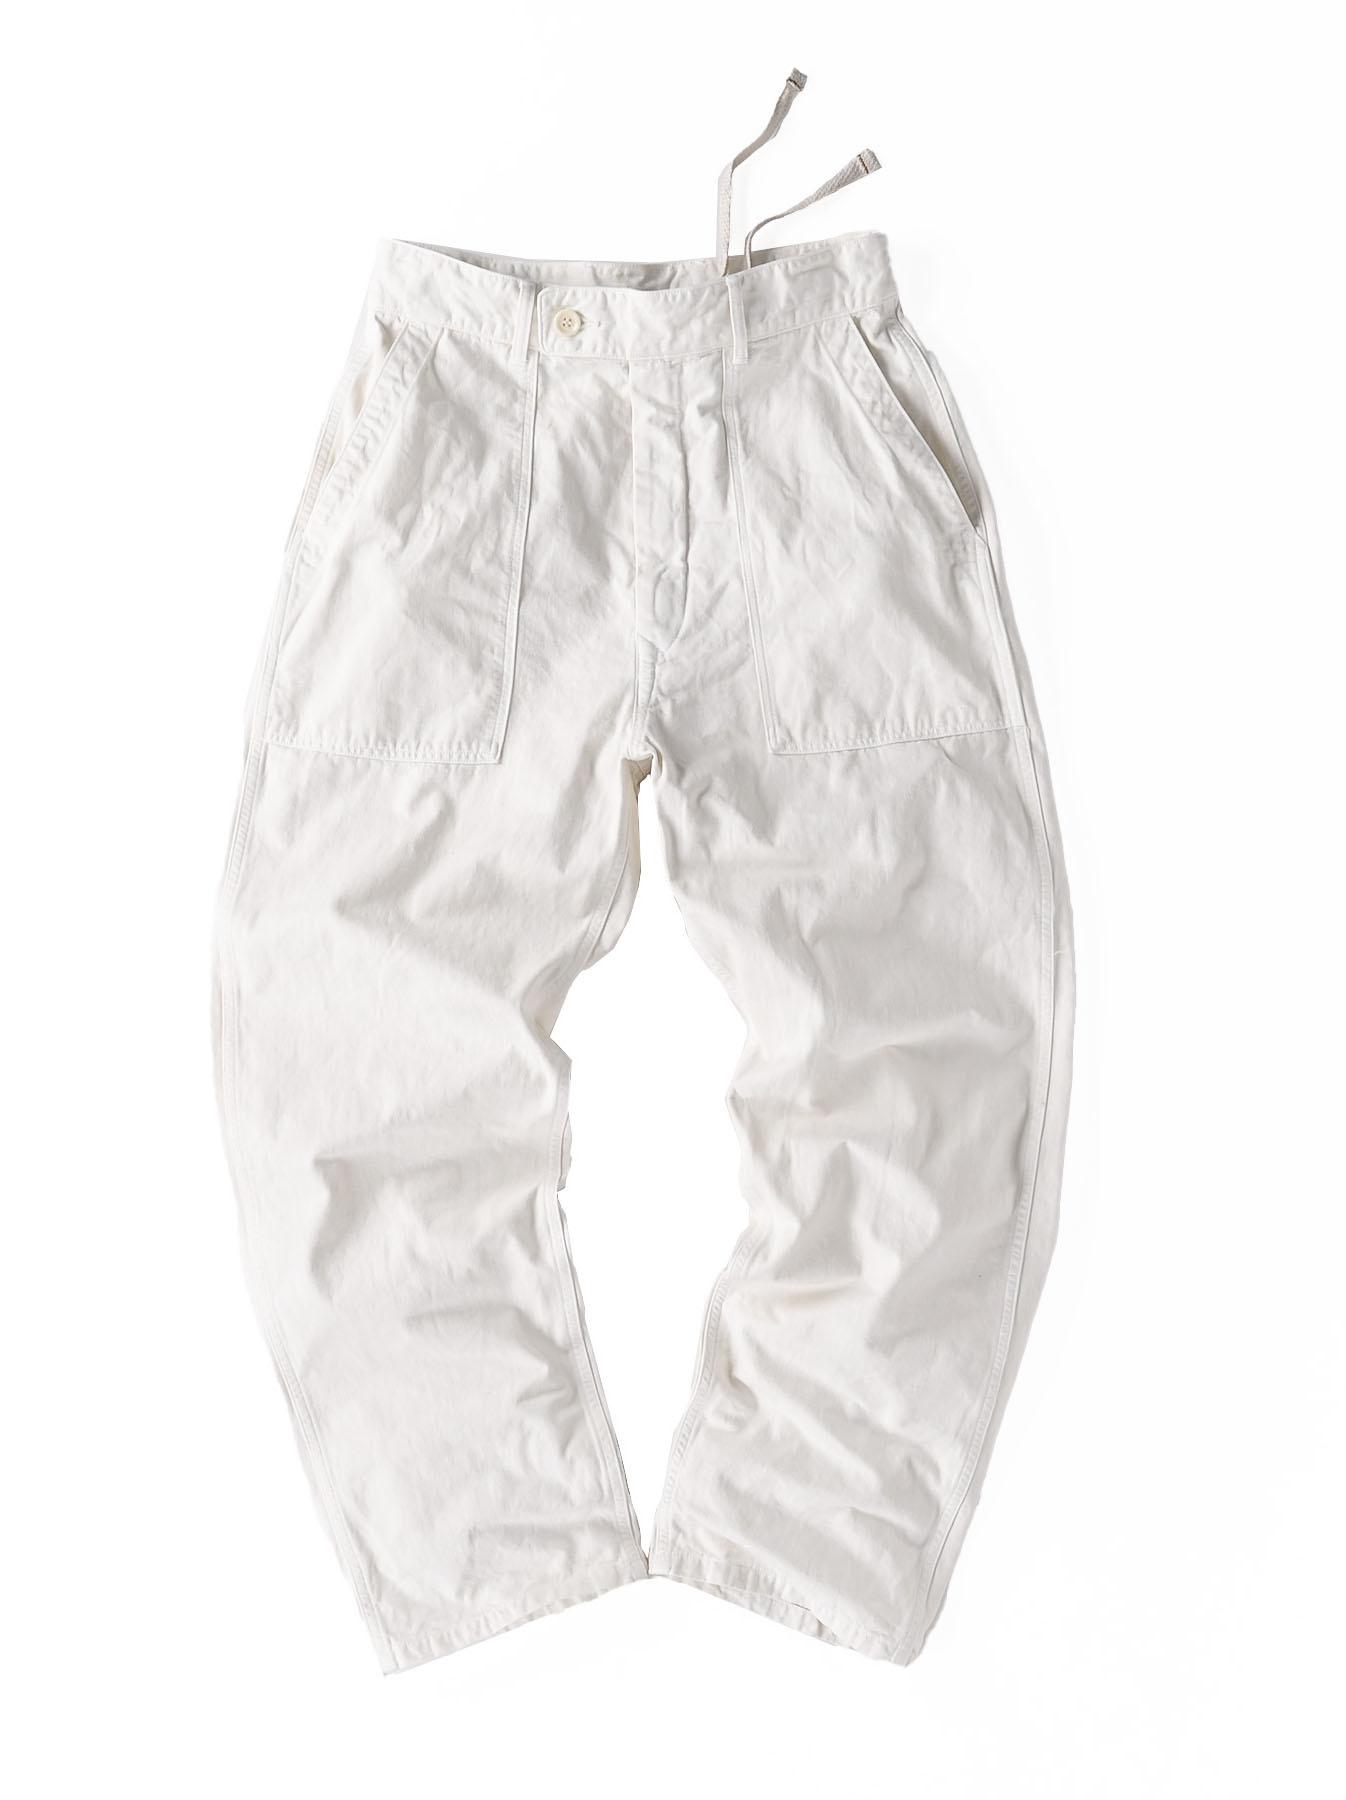 Yacht Cotton White 908 Baker Pants (0521)-1